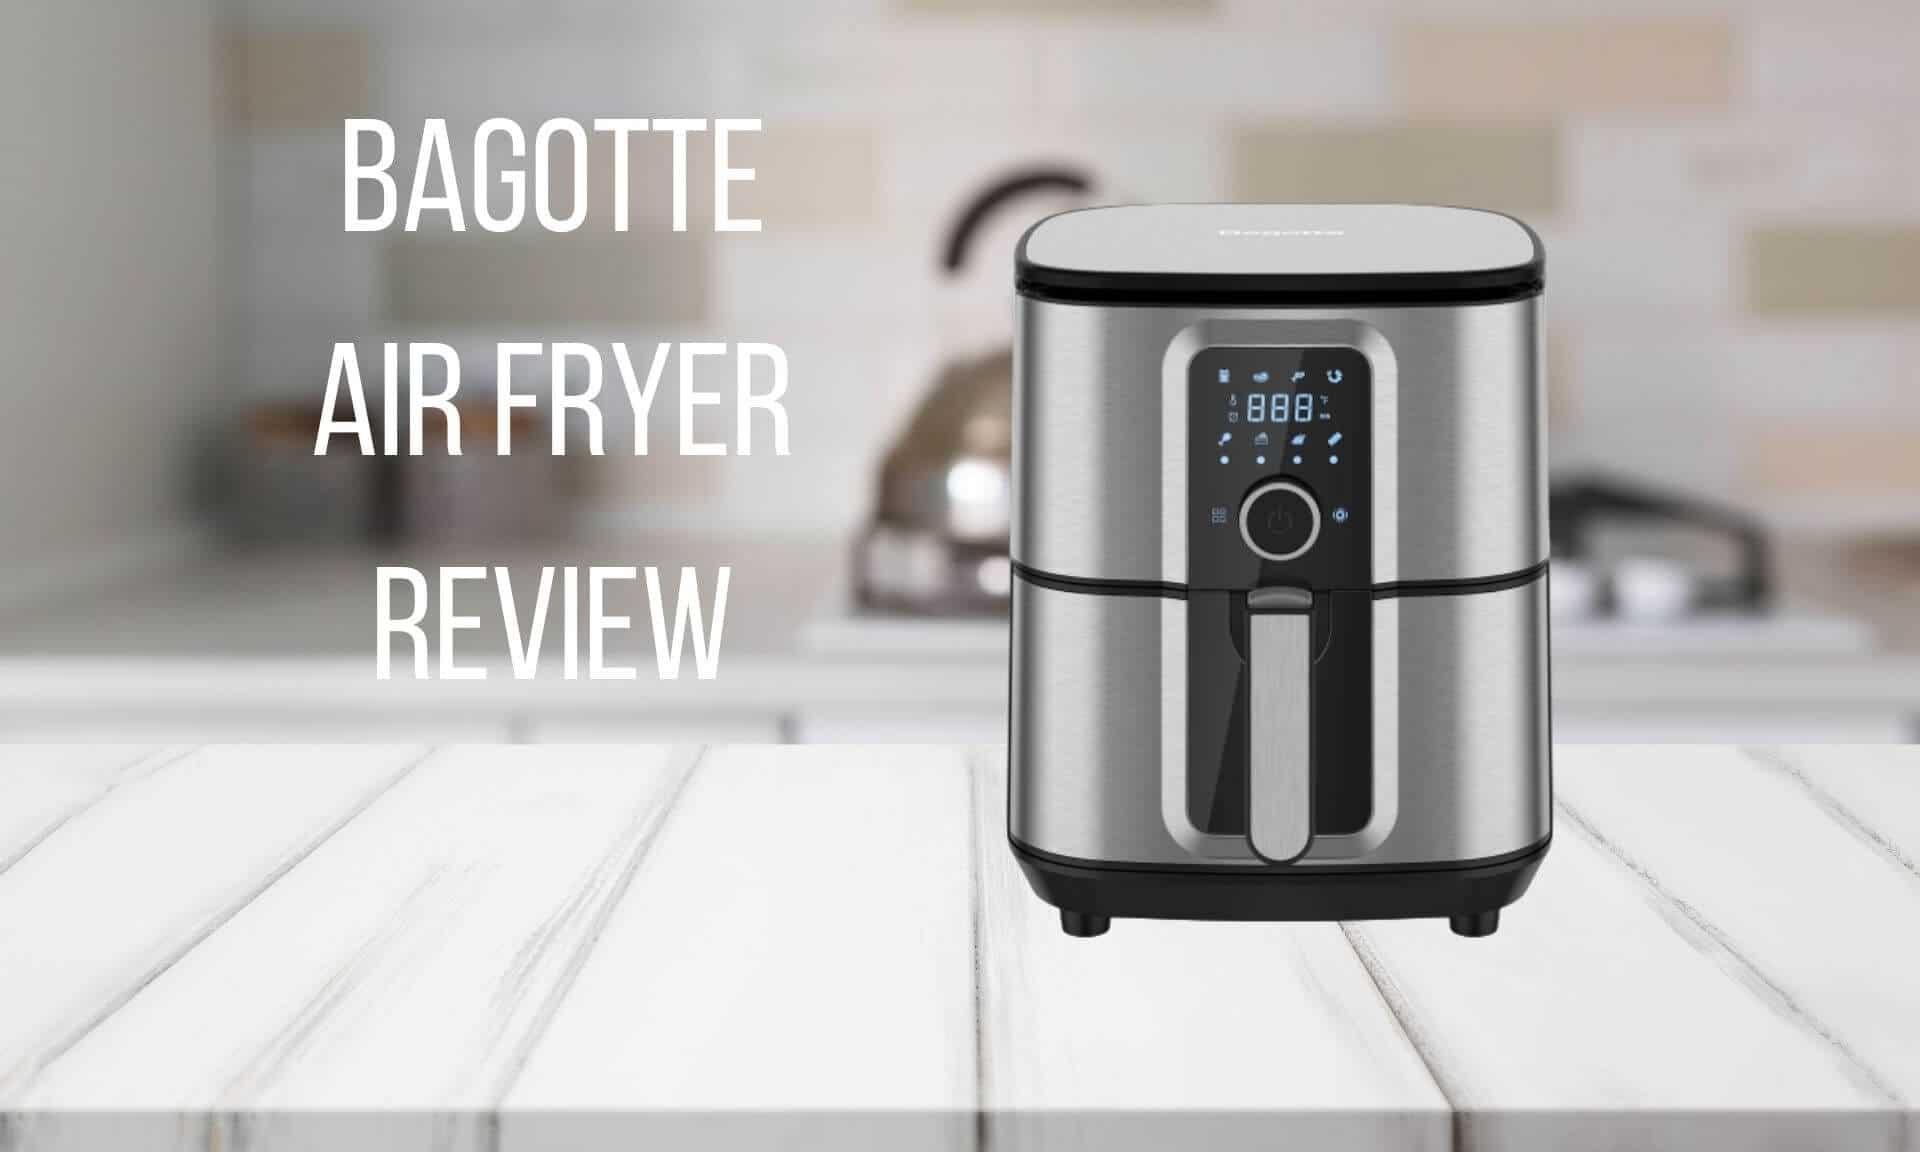 Bagotte Air Fryer Review